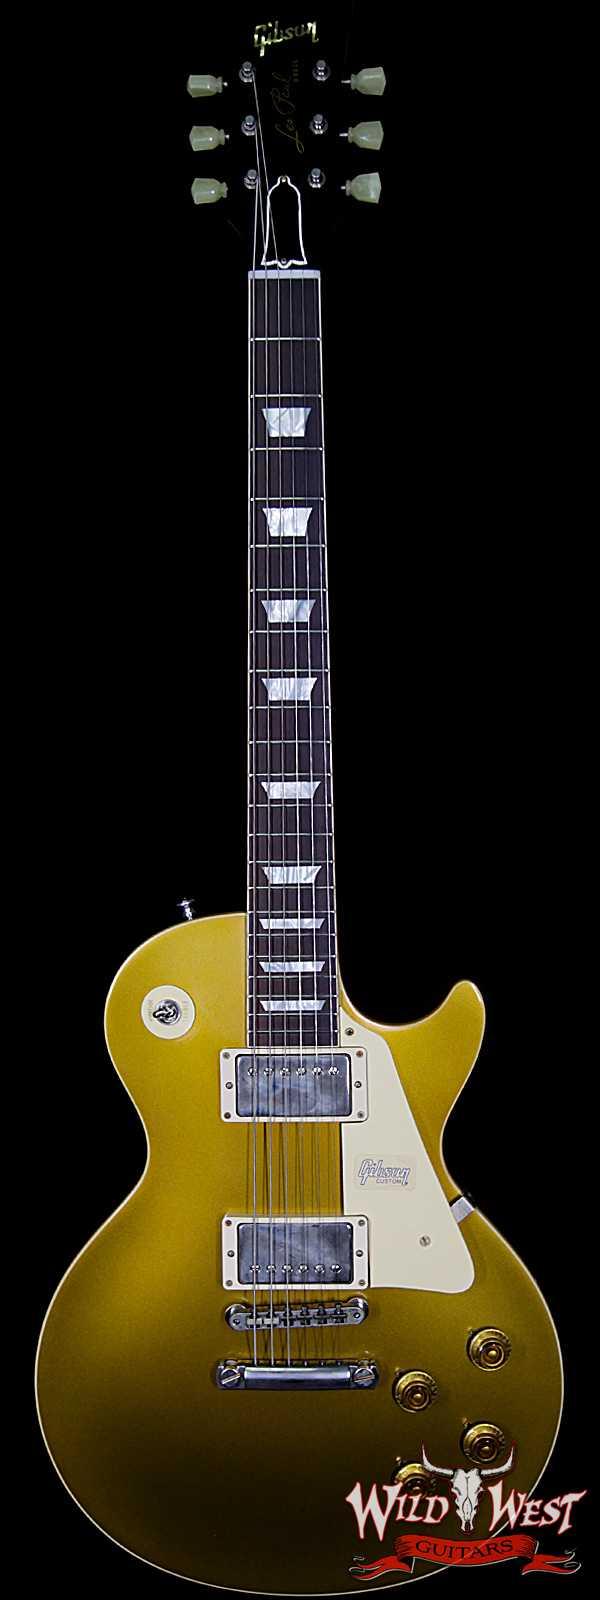 2018 Gibson Custom Shop Historic 57 Les Paul Standard VOS Brazilian Rosewood Fingerboard Goldtop 8.95 Lbs